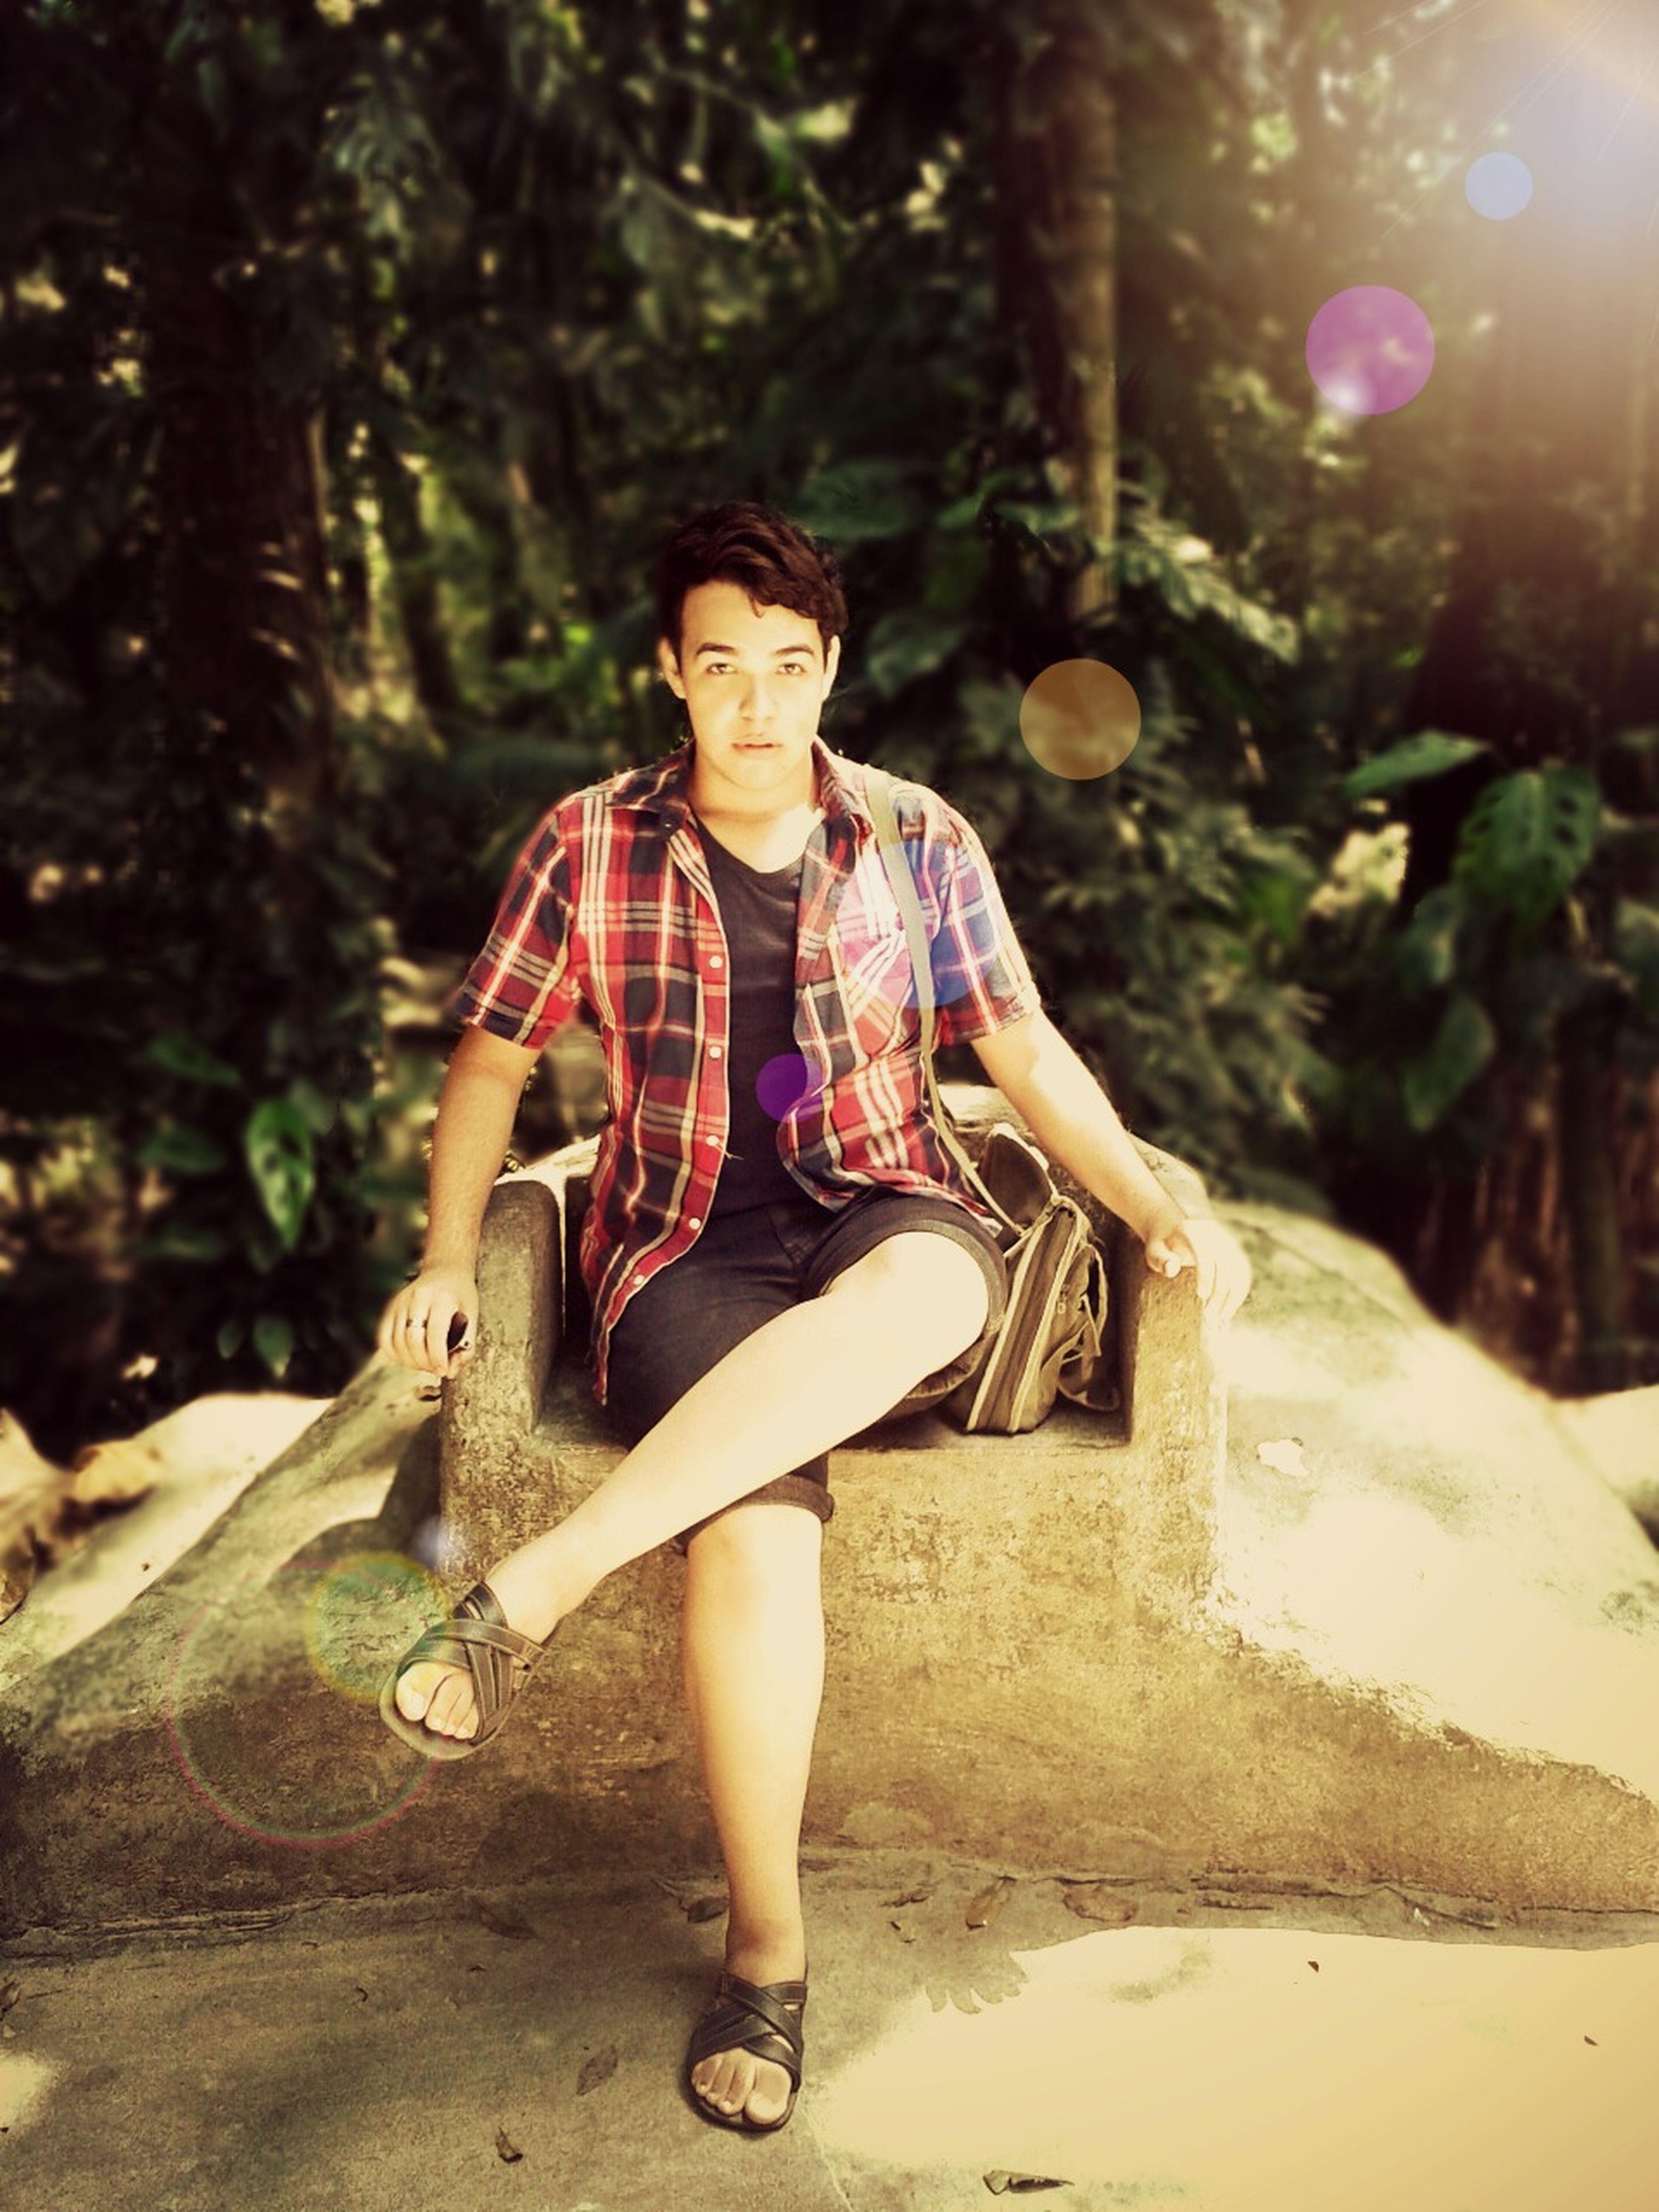 Sol Lindo. Amo D +. Guy Boy Cute Brasil